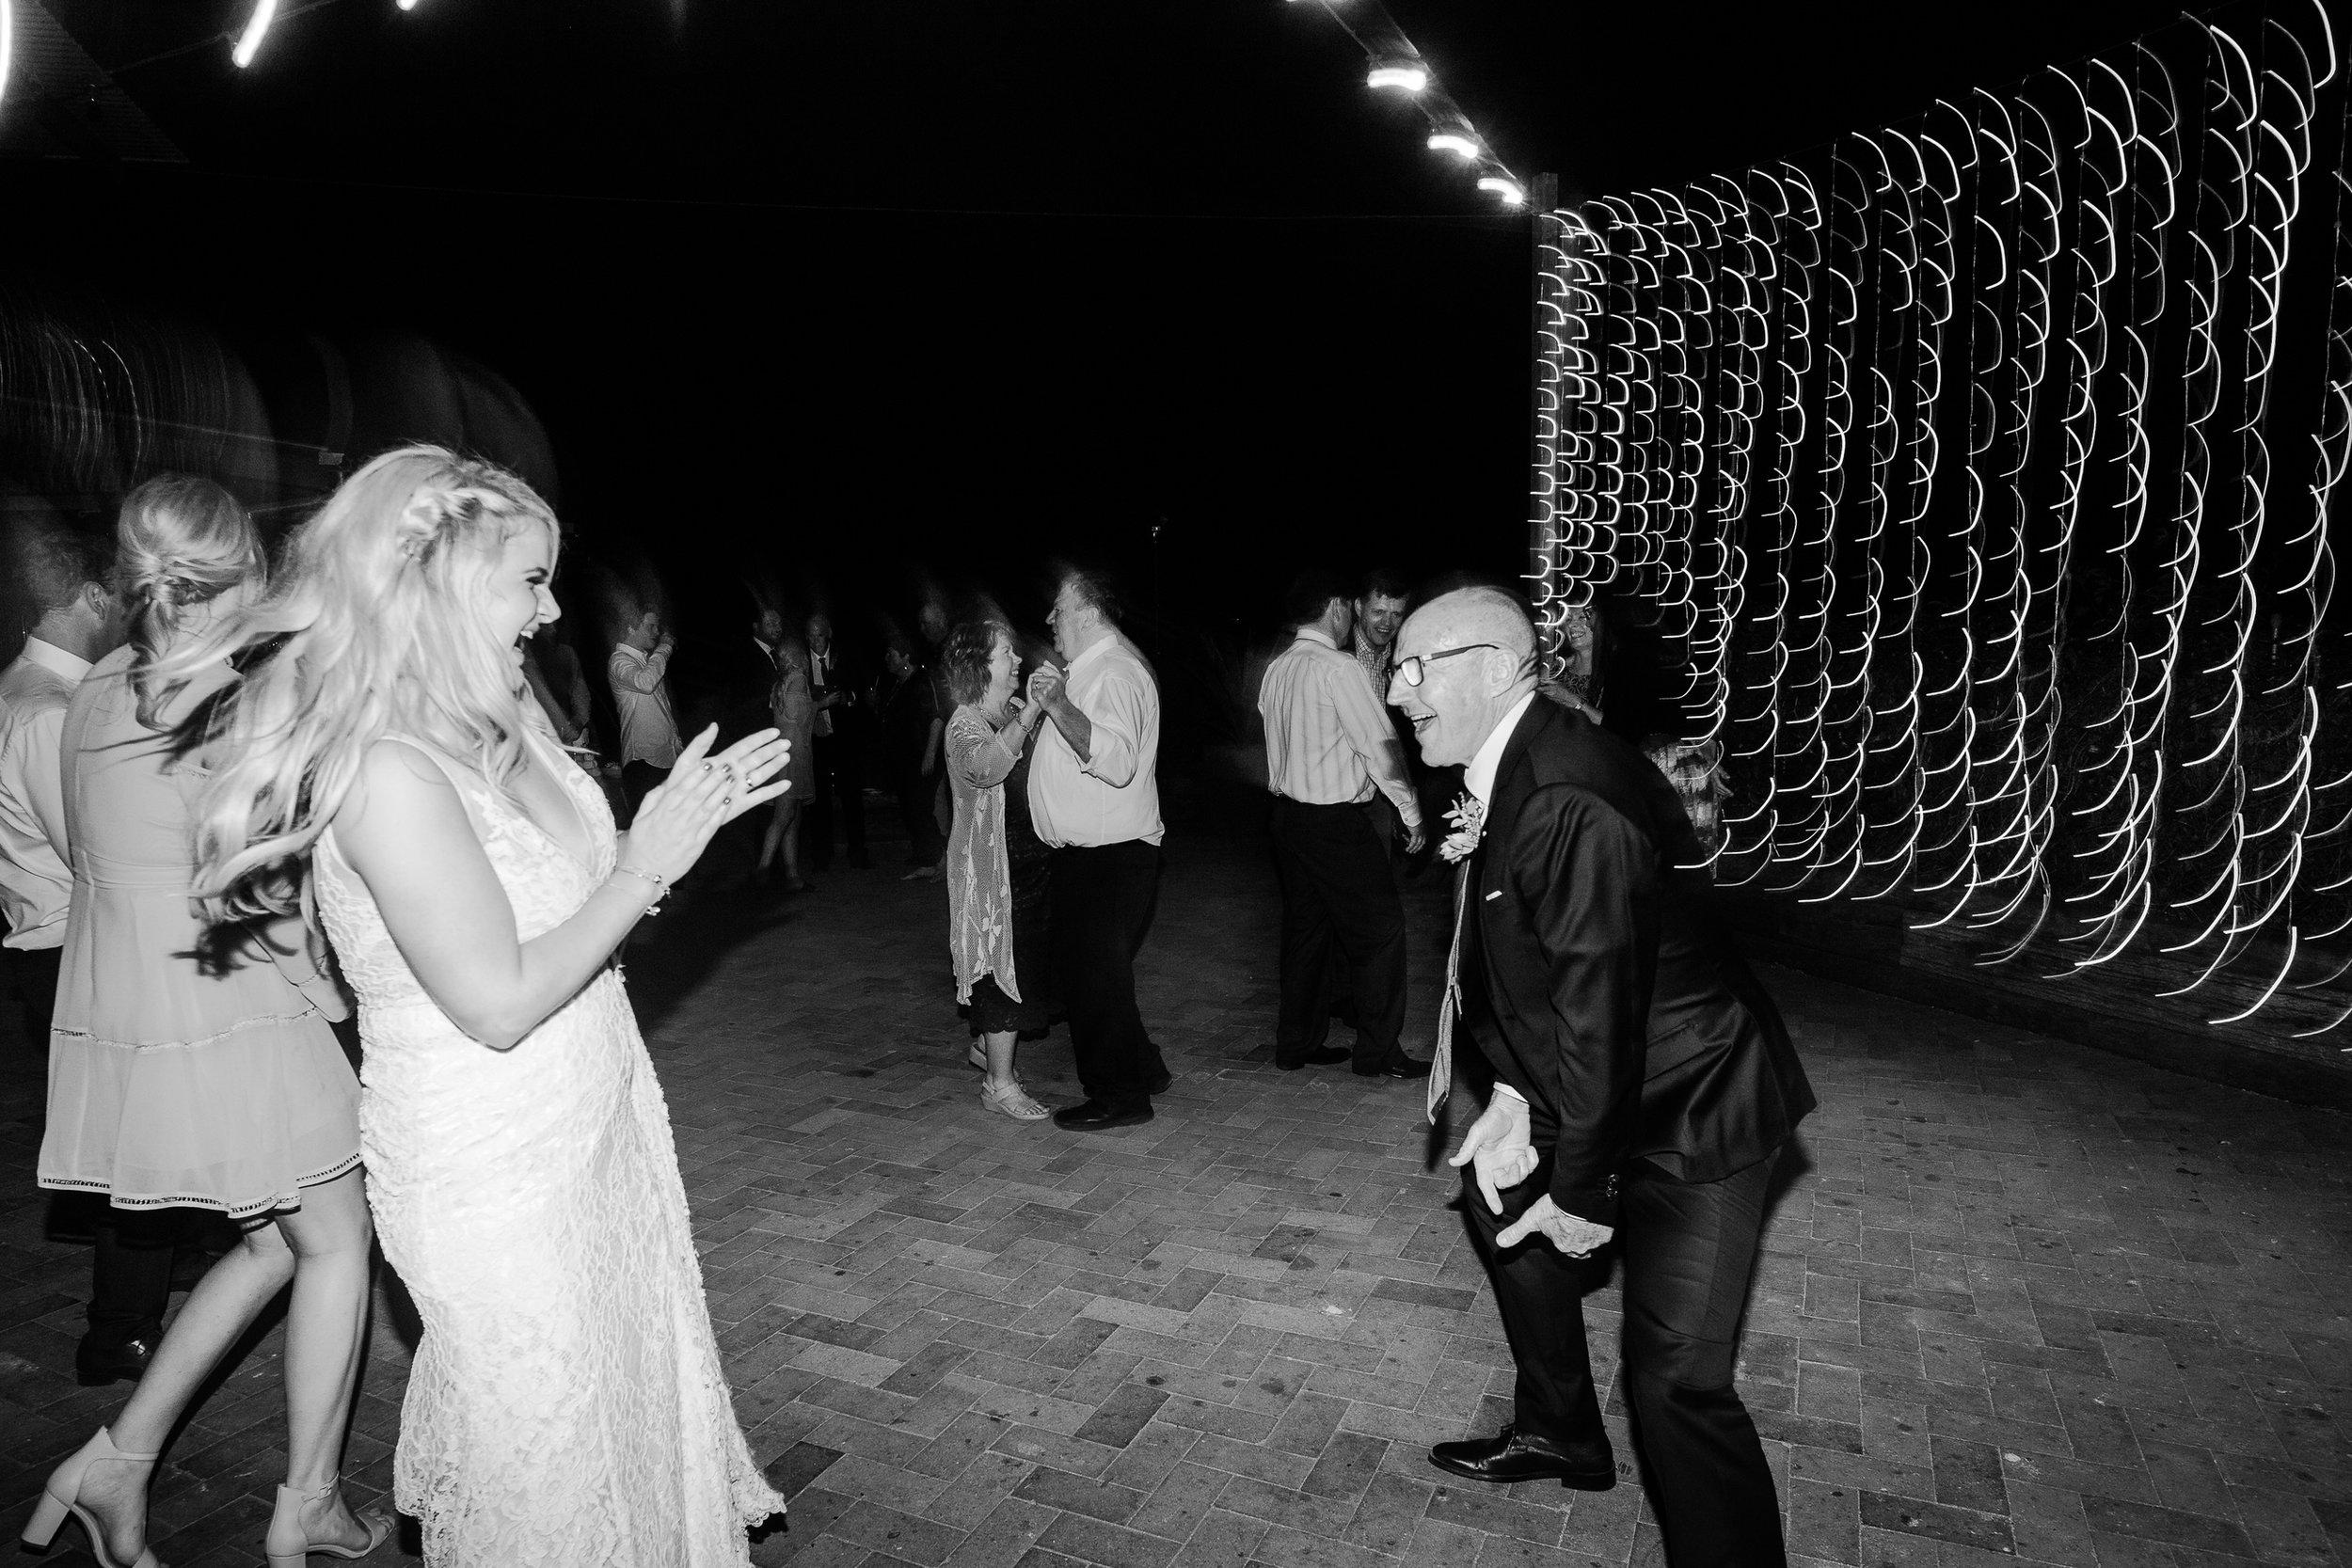 Justin_And_Jim_Photography_Byron_Bay_Wedding115.JPG